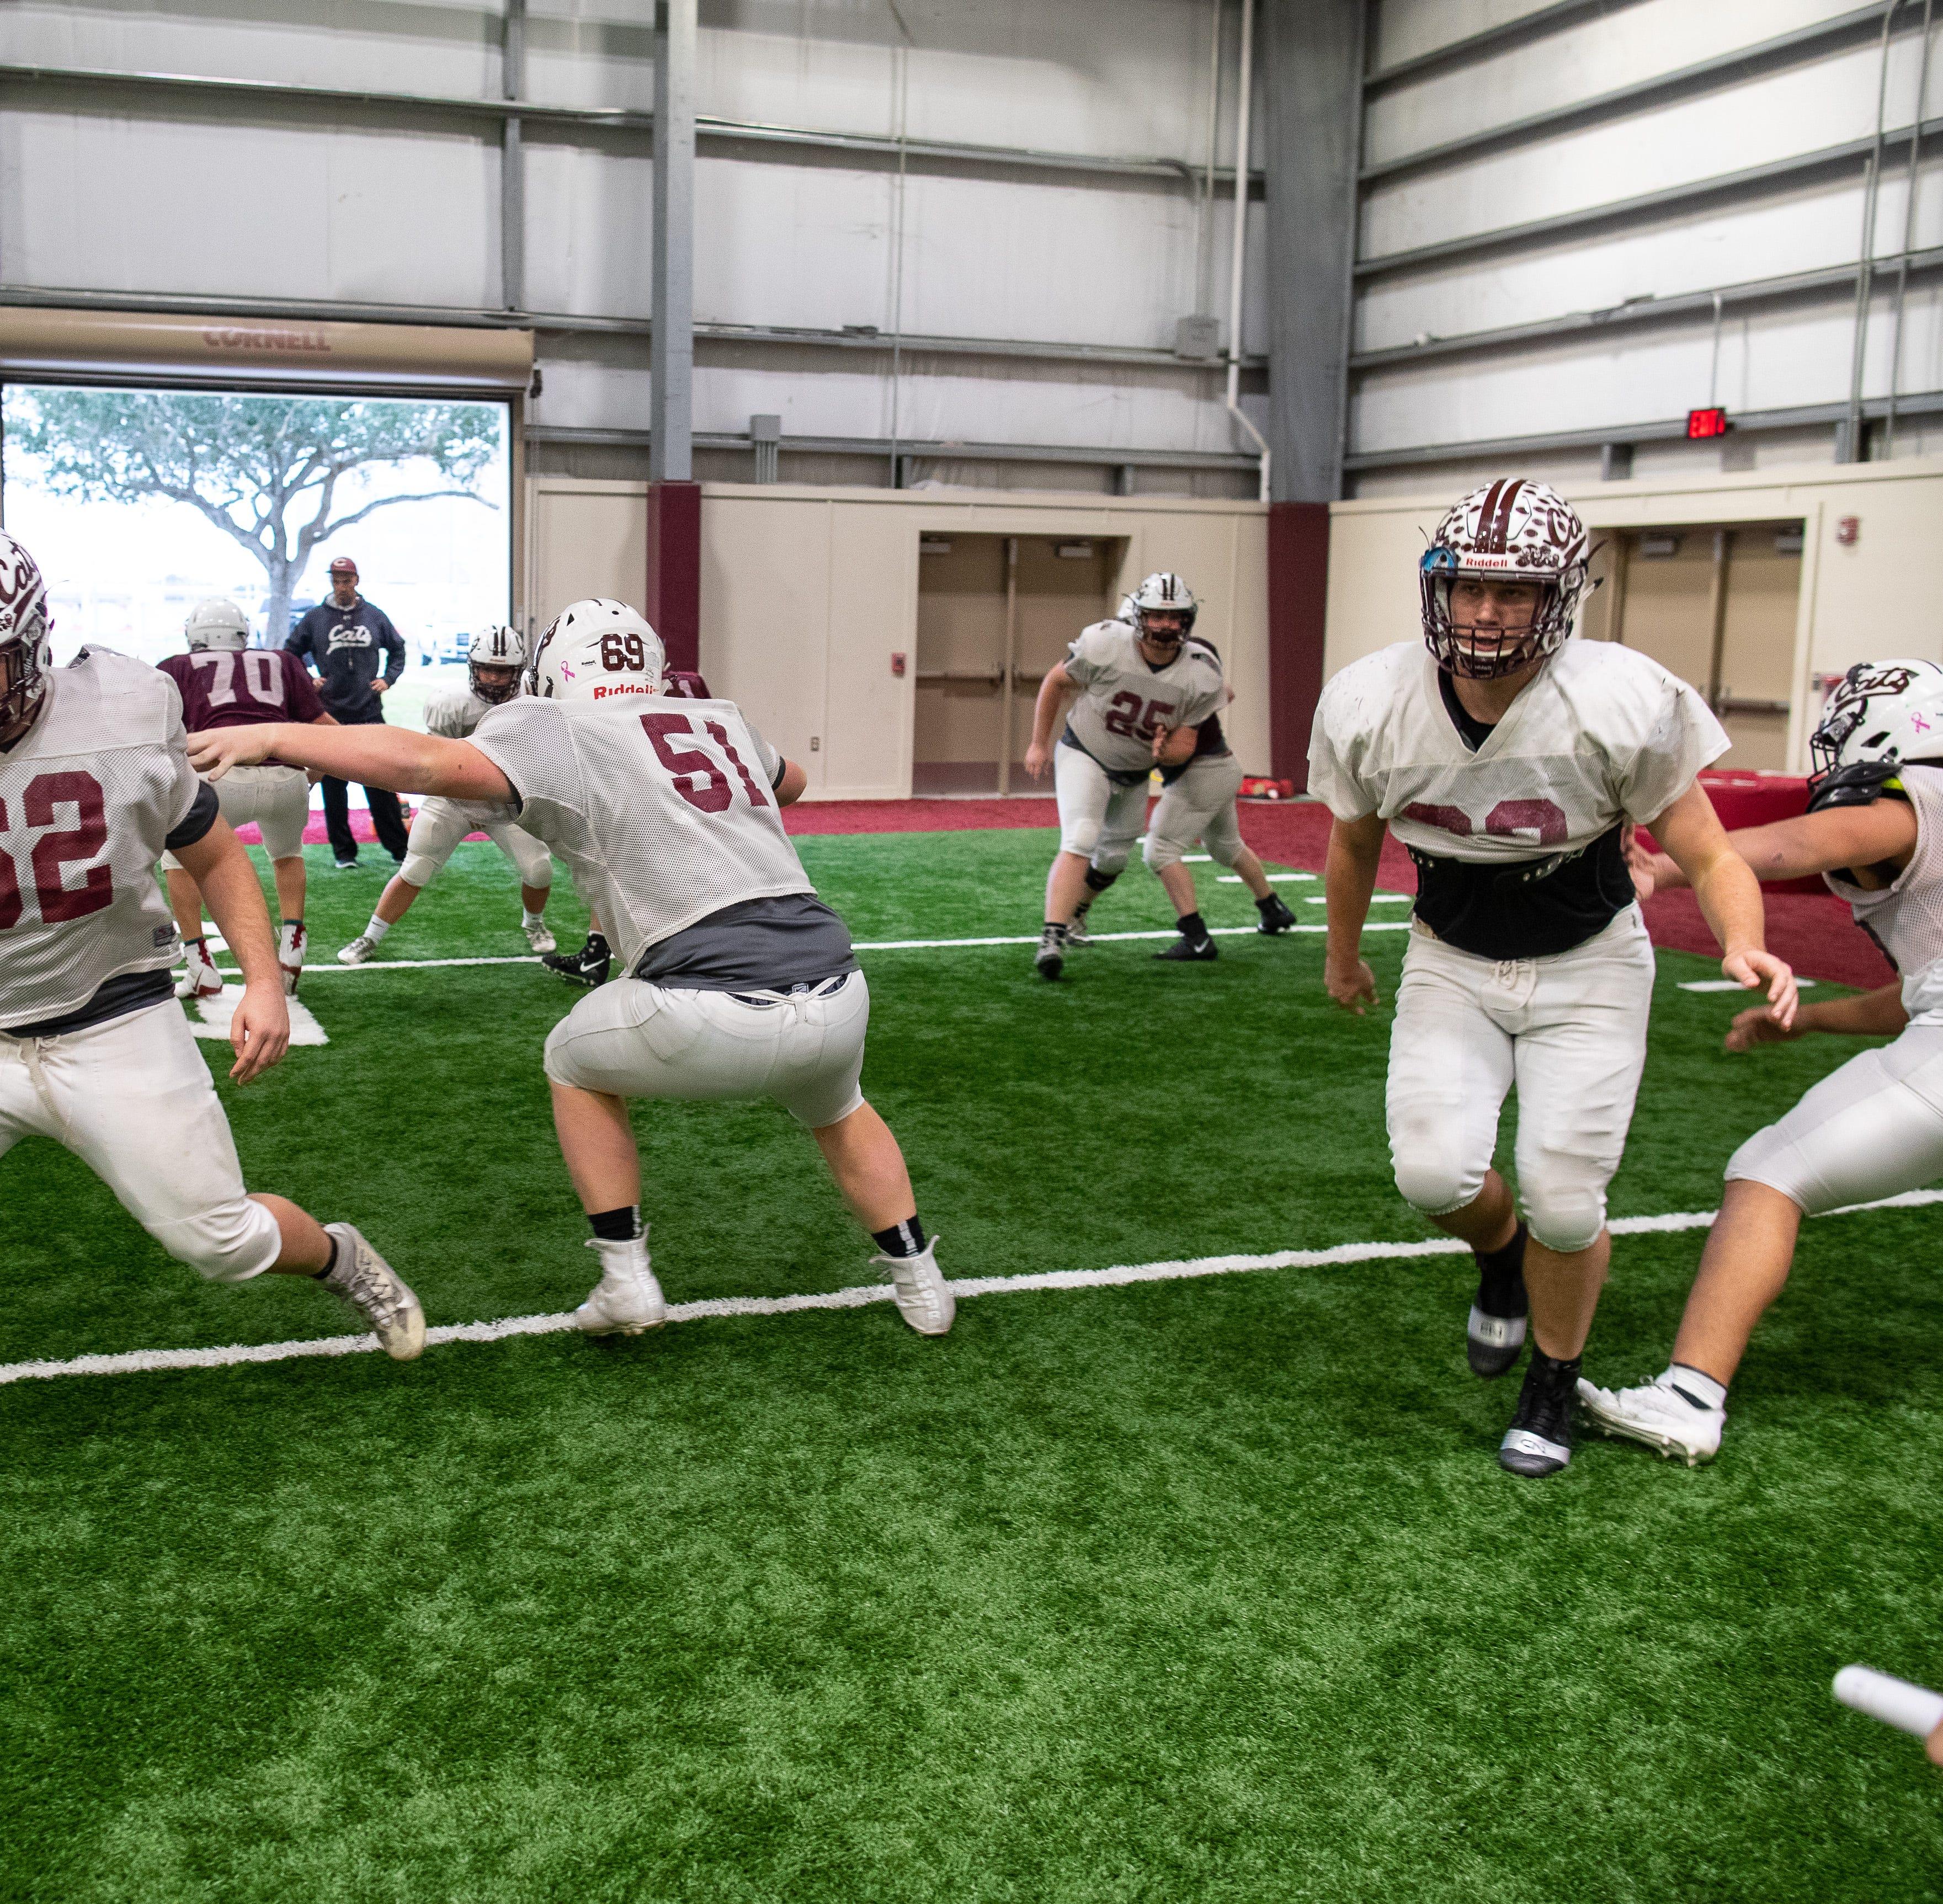 New-look Calallen offensive line finding stride in Texas High School Football playoffs